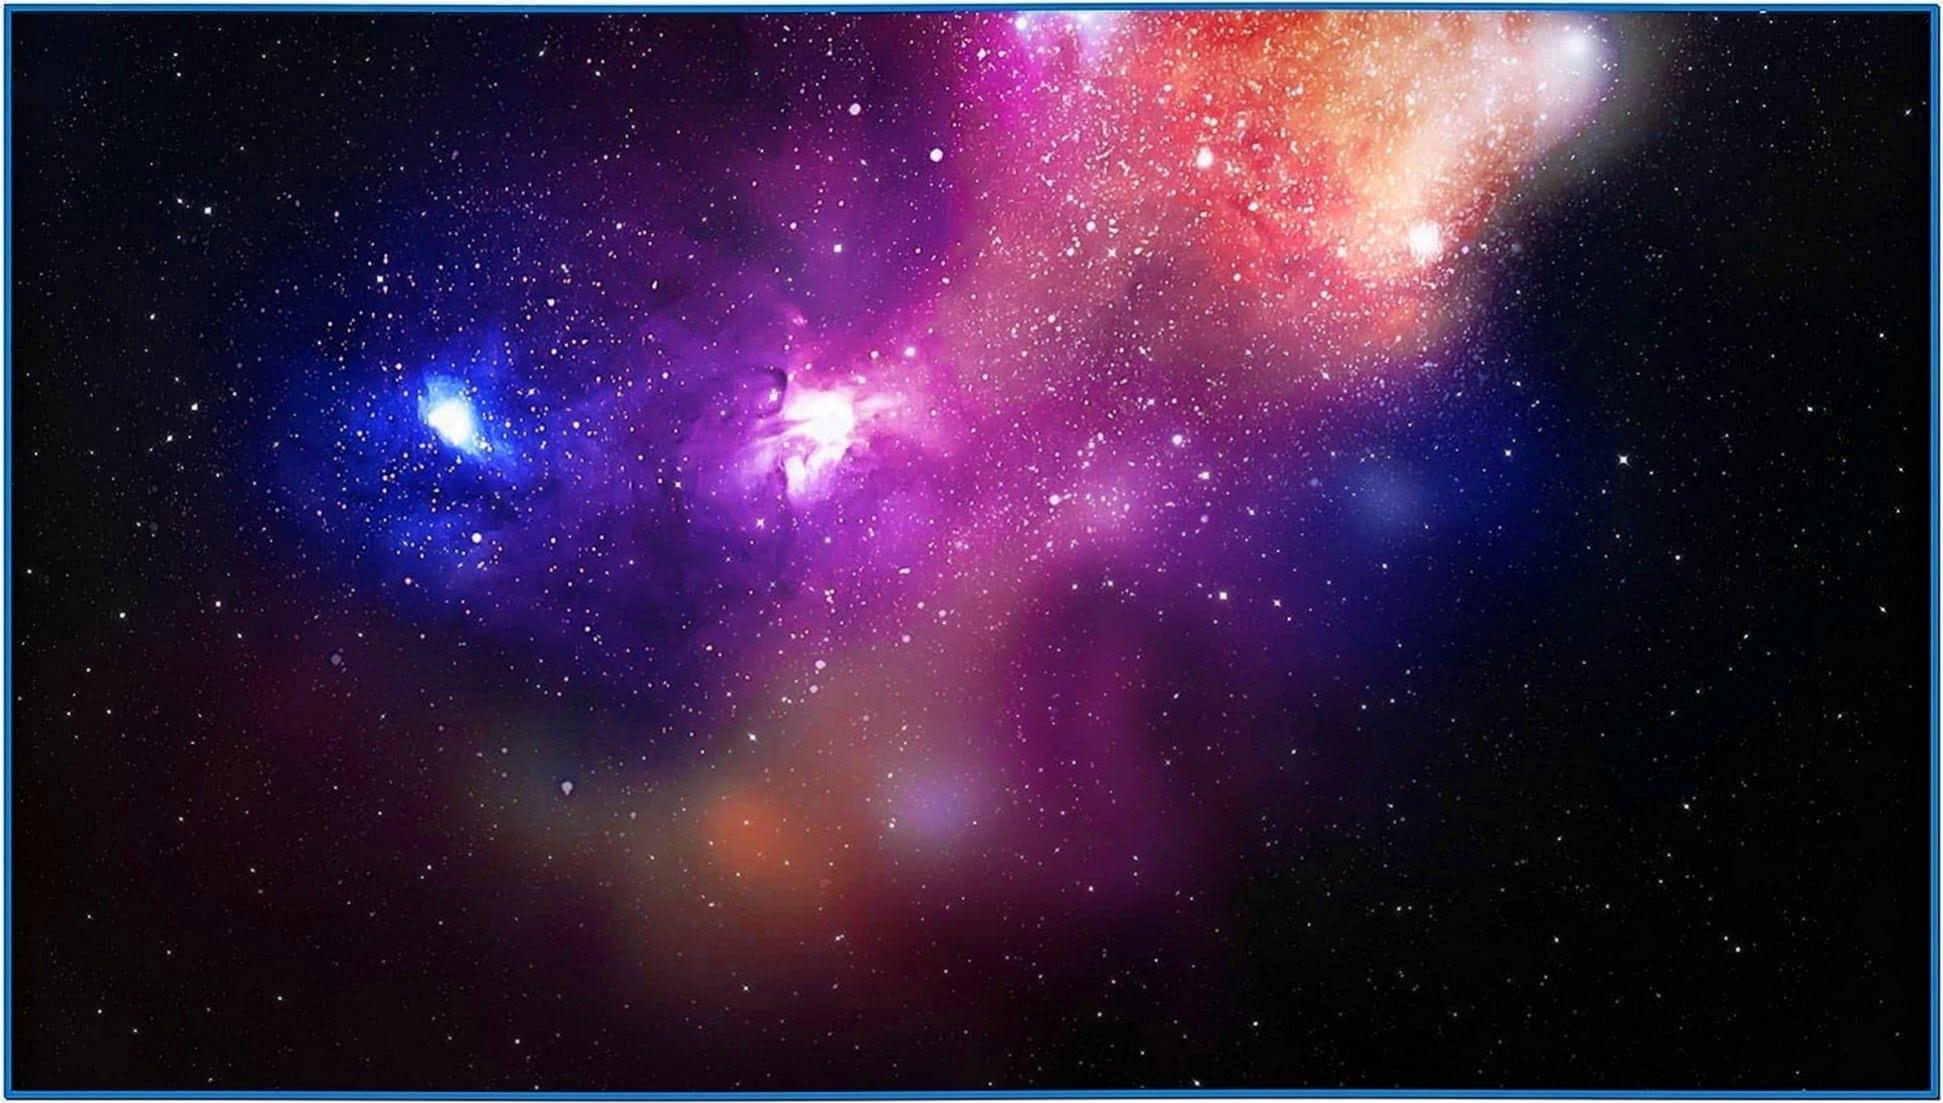 Space Screensaver Mac Lion